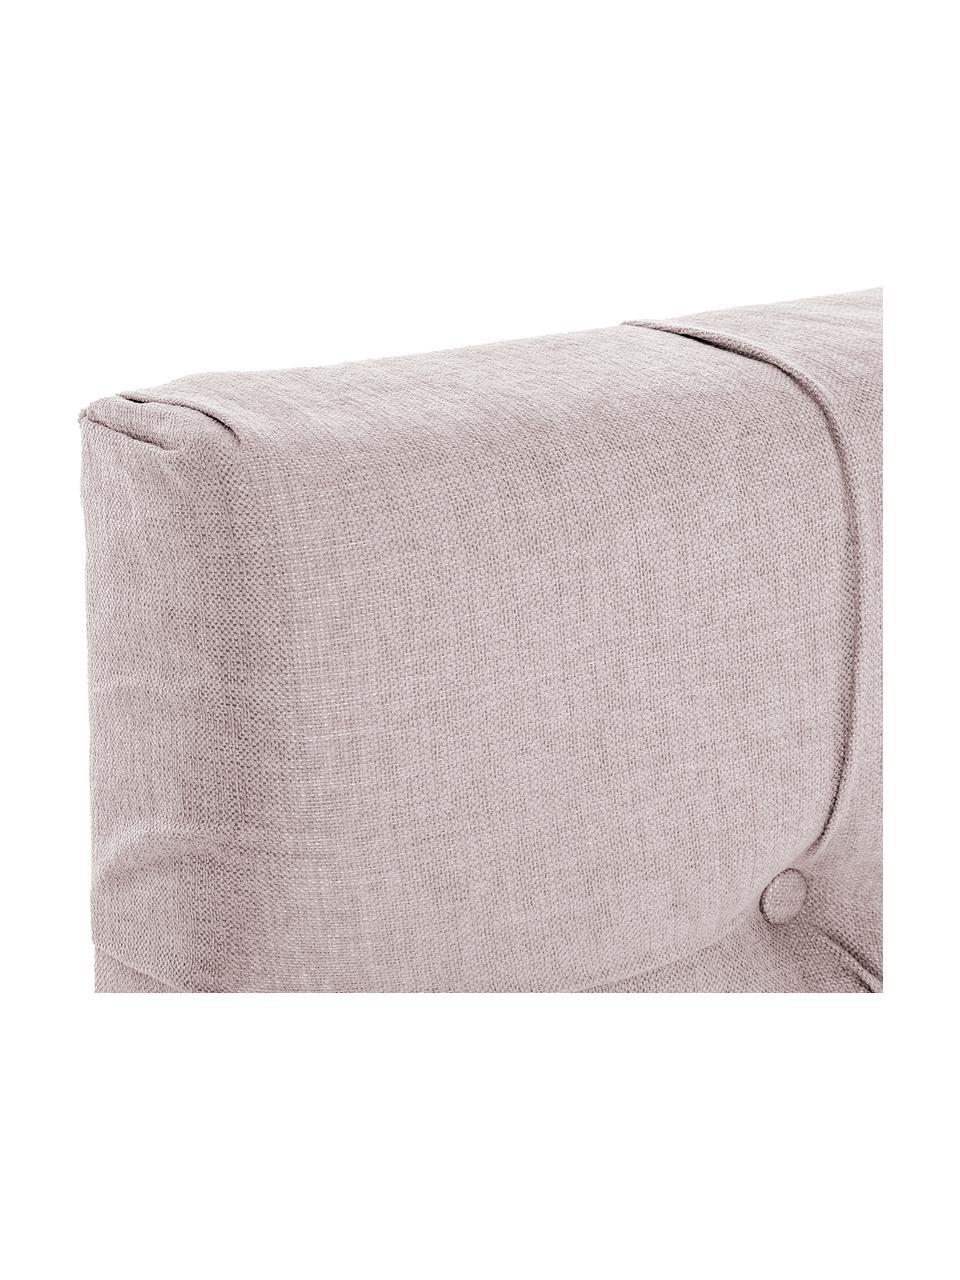 Premium boxspring bed Phoebe, Matras: 7-zones-pocketveringkern , Poten: massief gelakt beukenhout, Oudroze, 180 x 200 cm